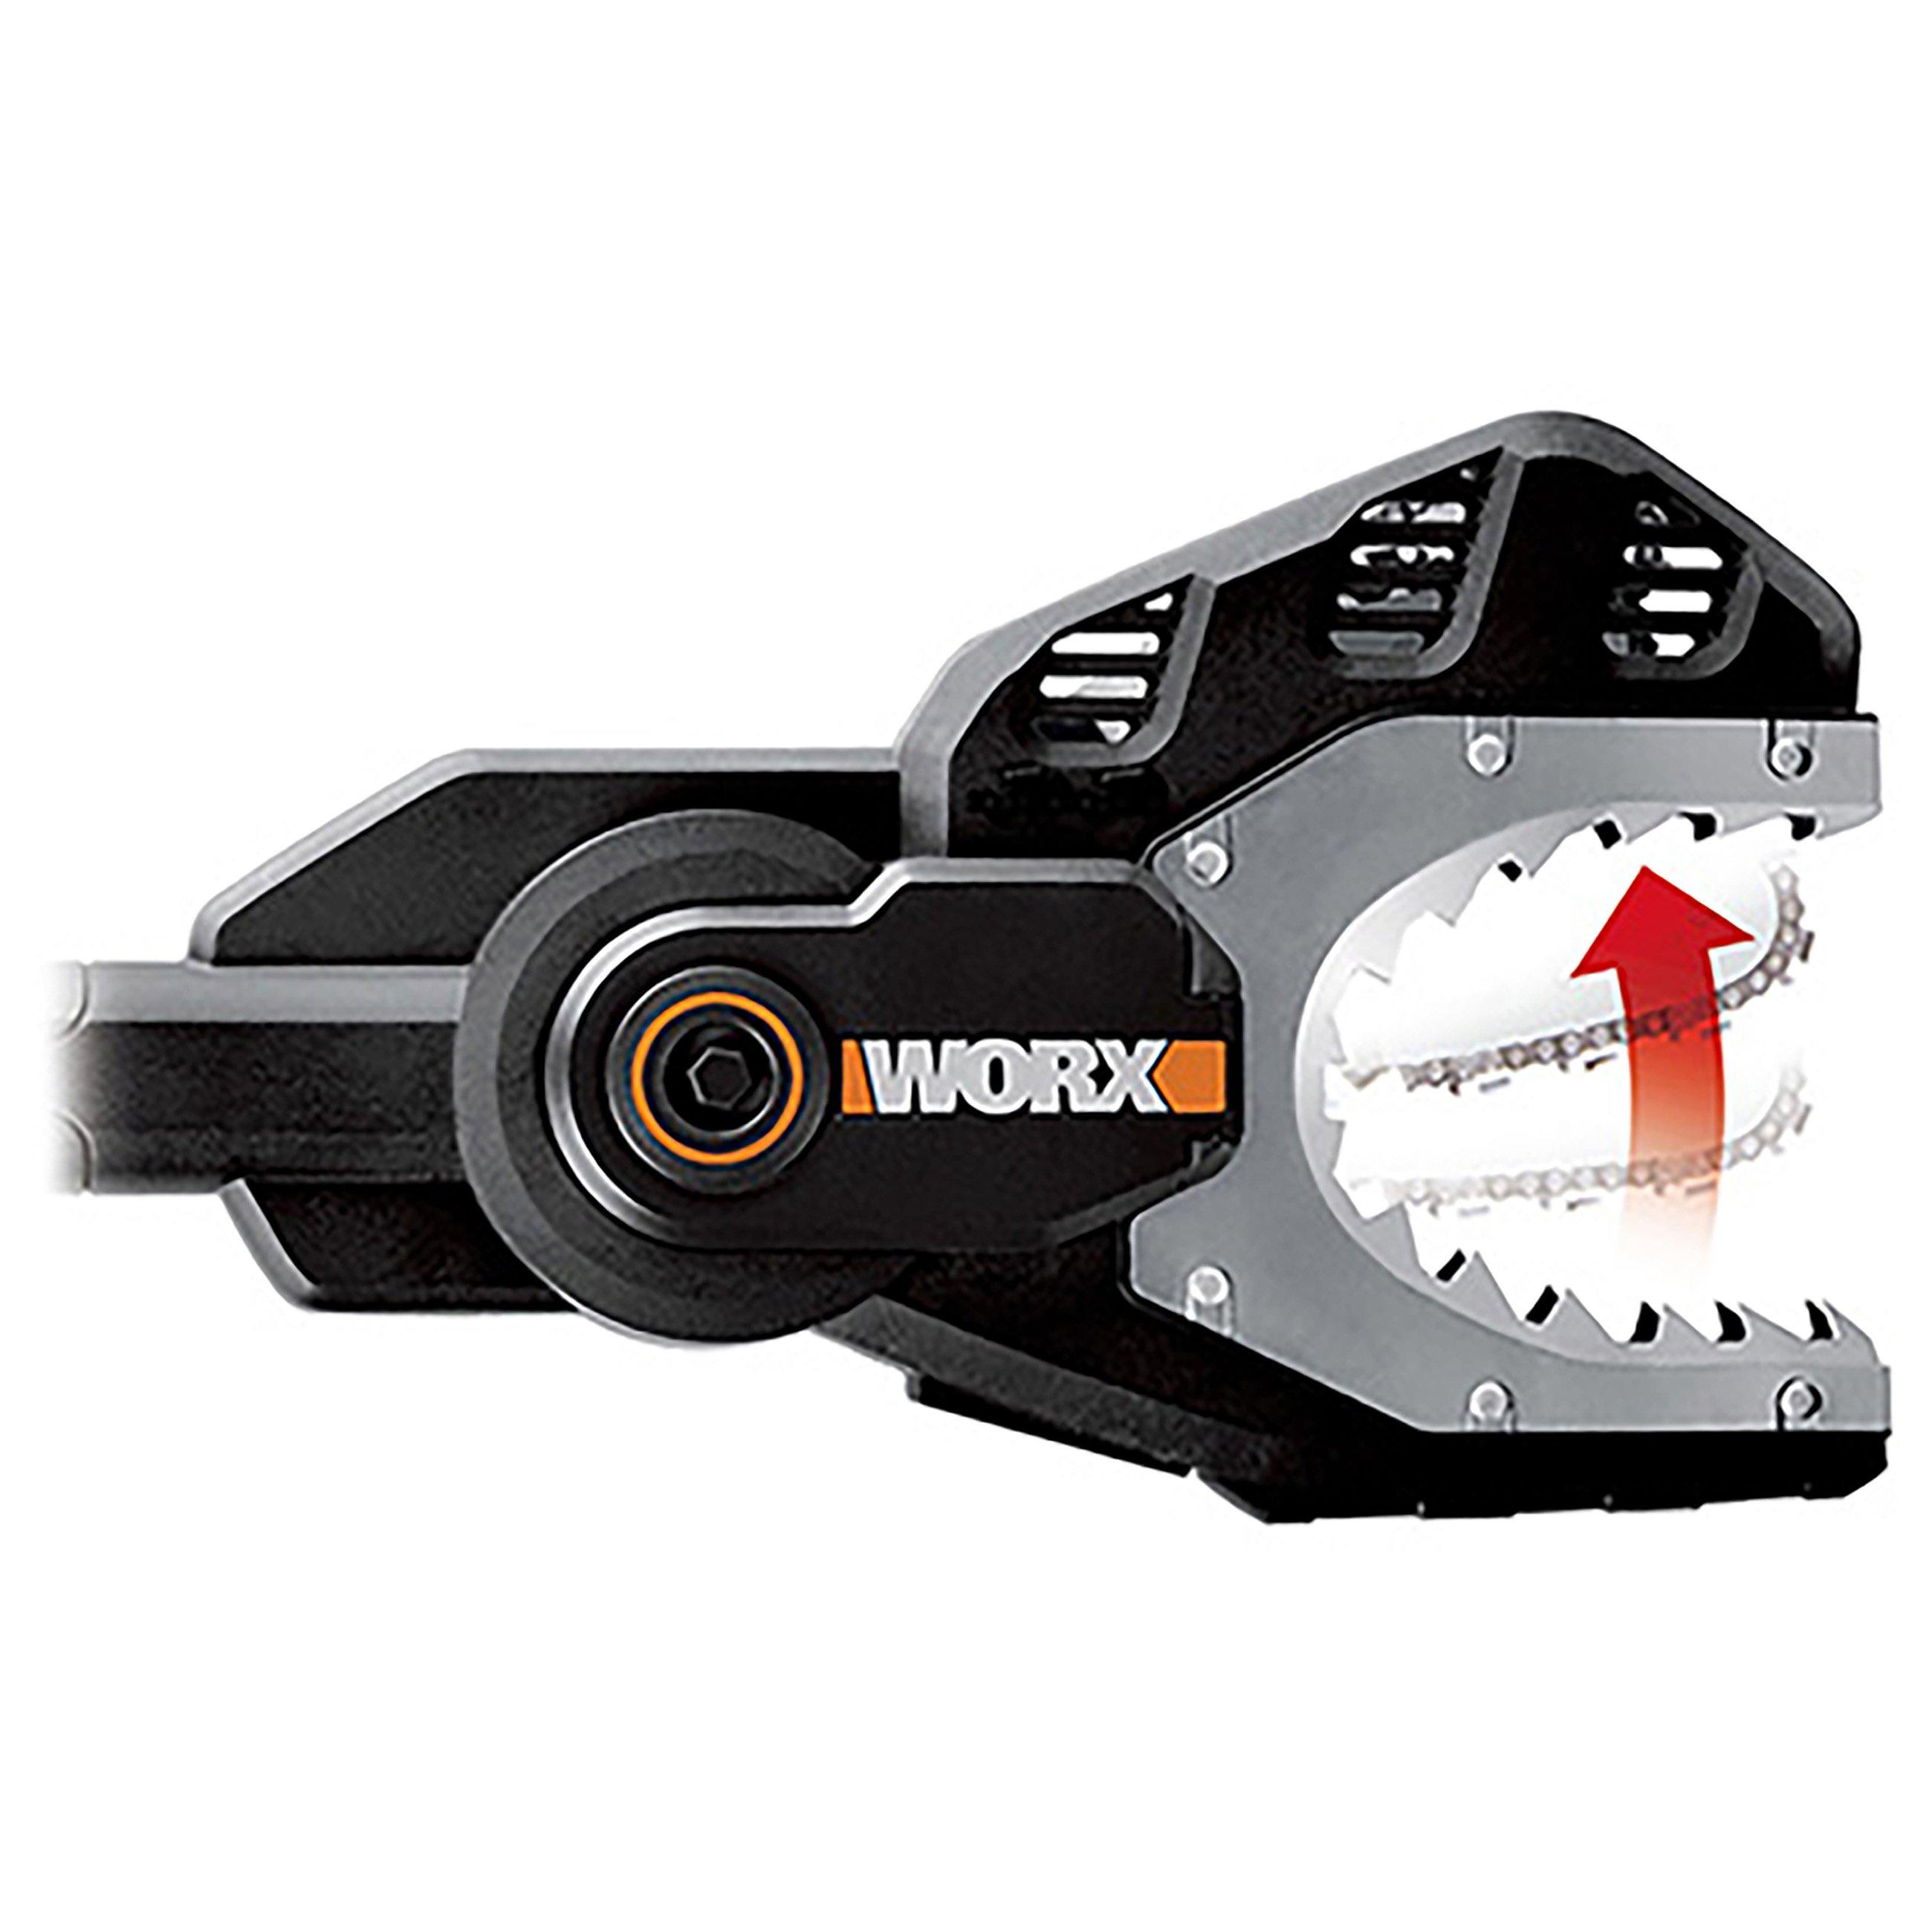 Worx WG329E.9 20V Astsäge Jawsaw, ohne Akku, Stahlzähne